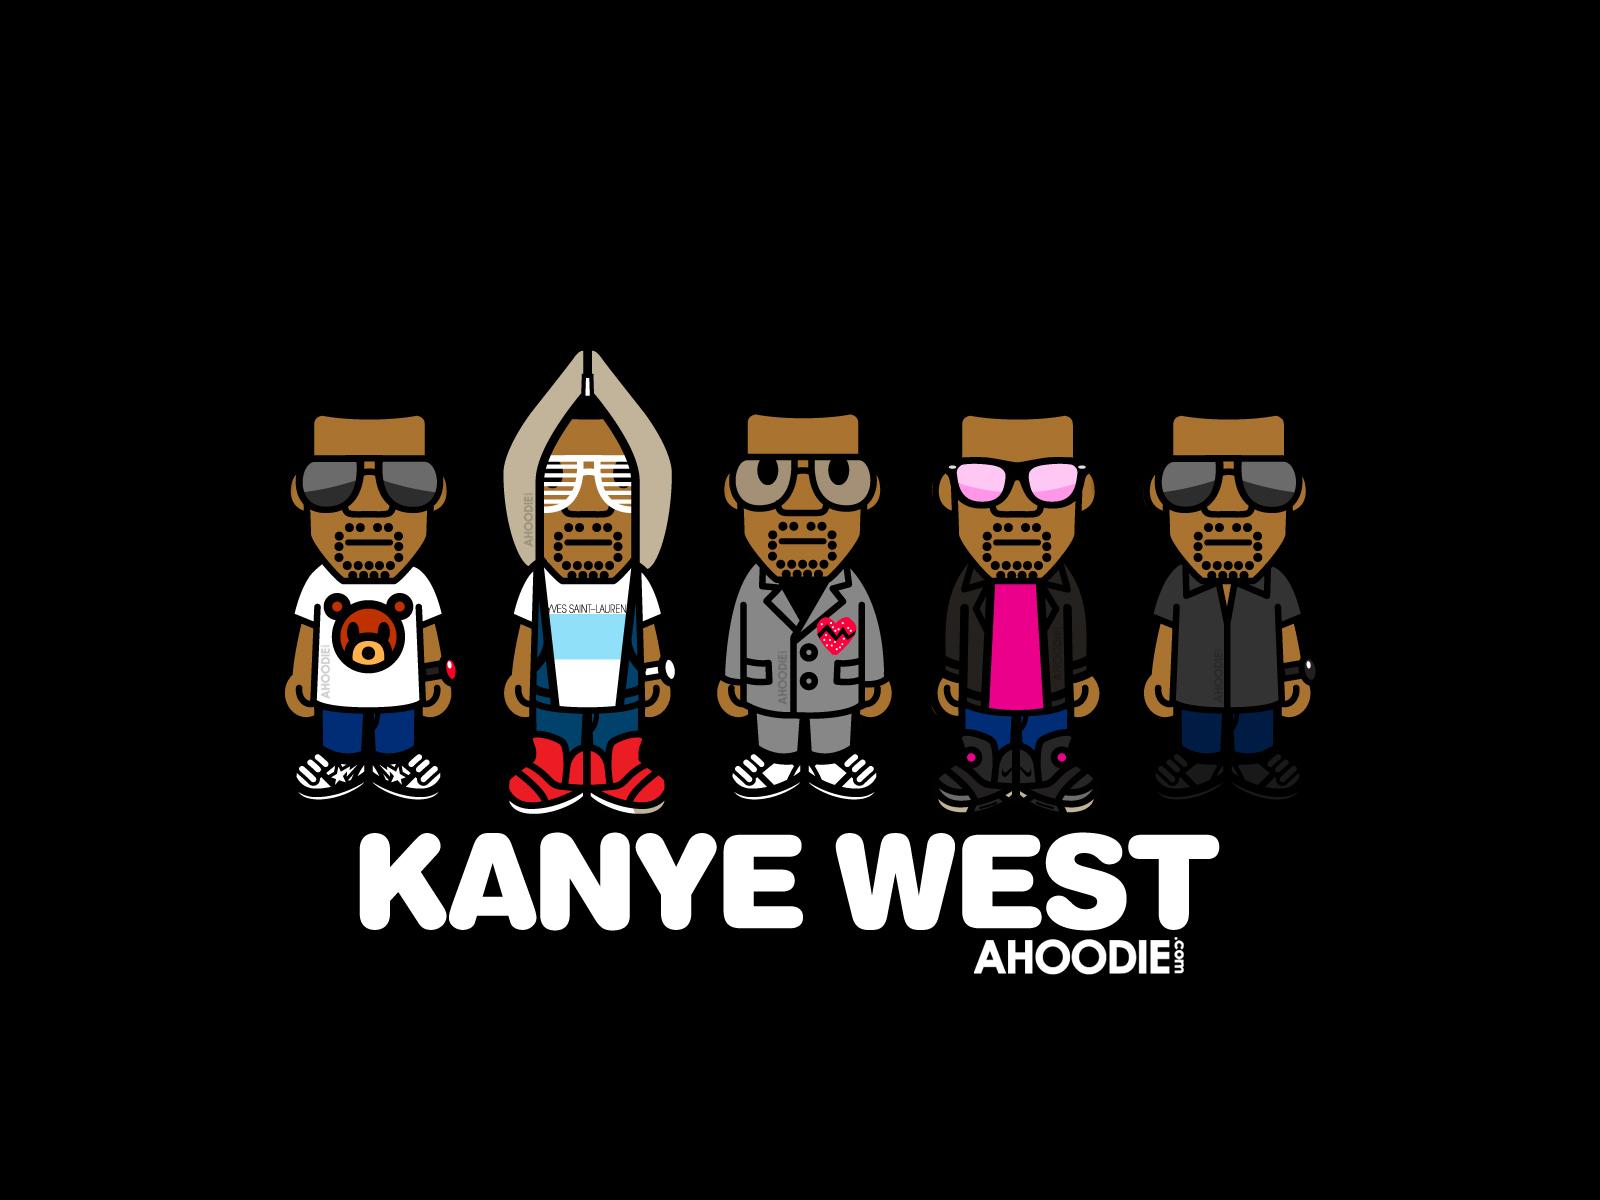 Kanye West Cartoon Wallpaper - Kanye West Cartoon Wallpaper